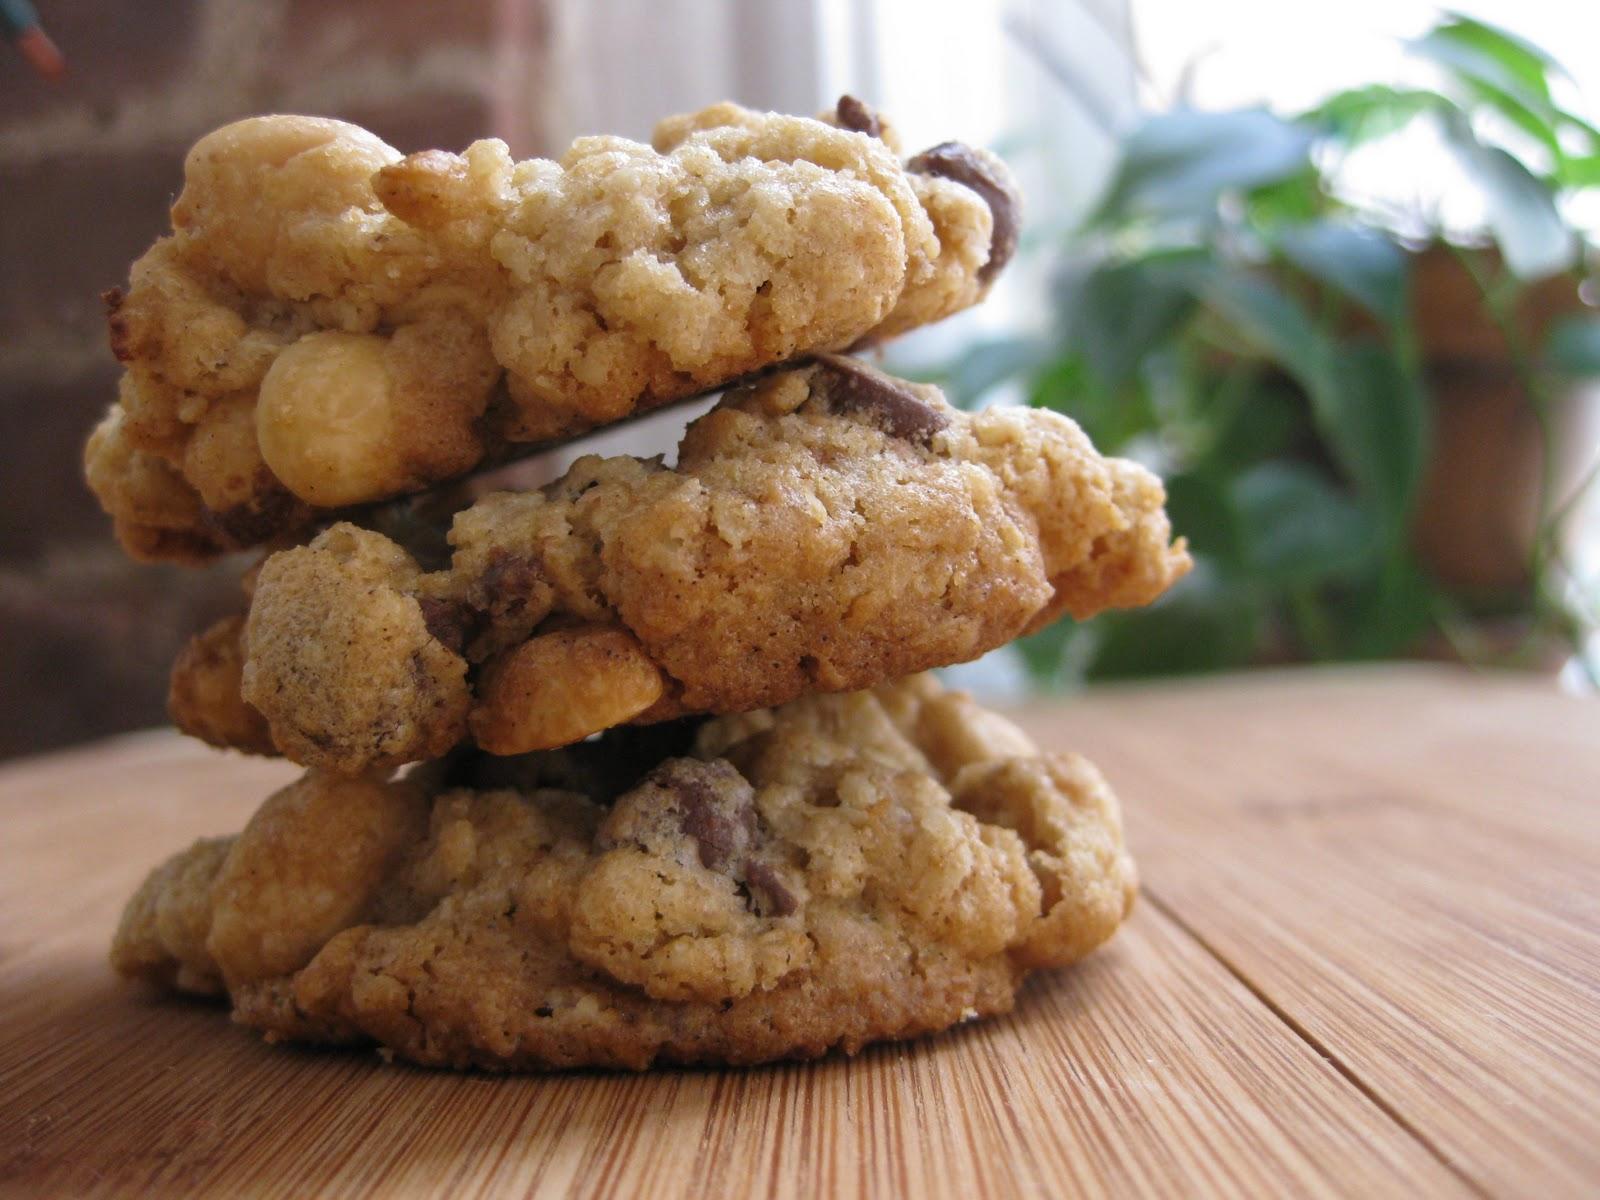 Sunday Treats: Peanut Butter Chocolate Chip Oatmeal Cookies